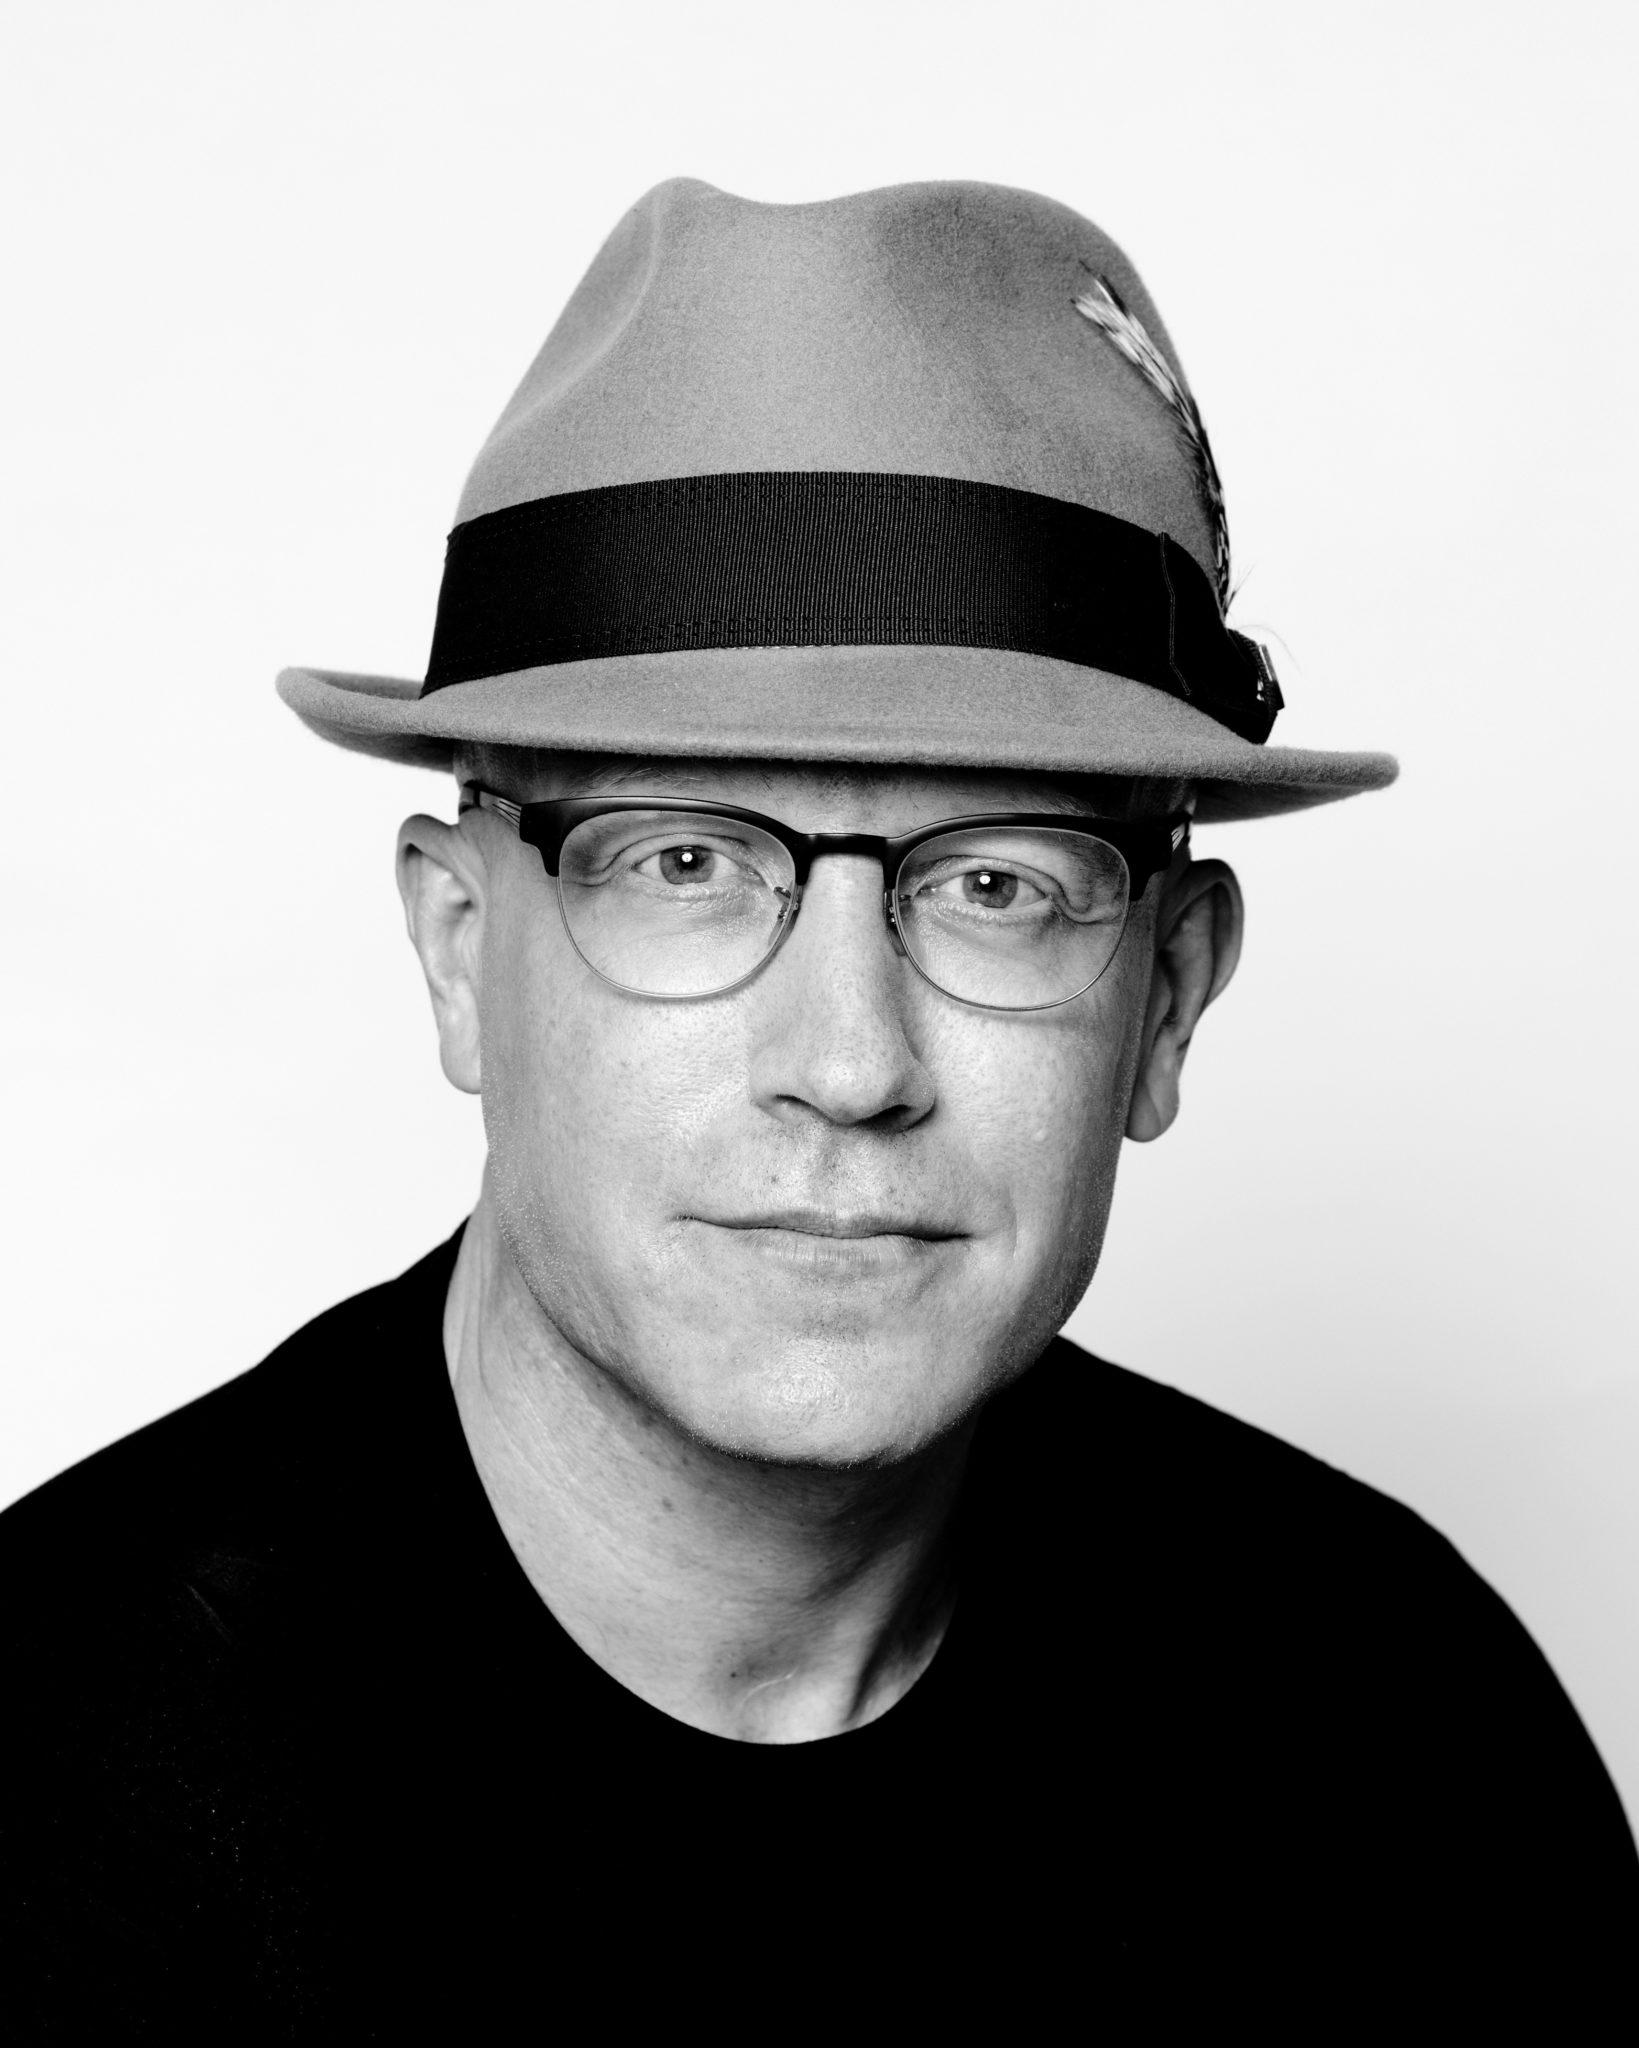 Ian Lawson